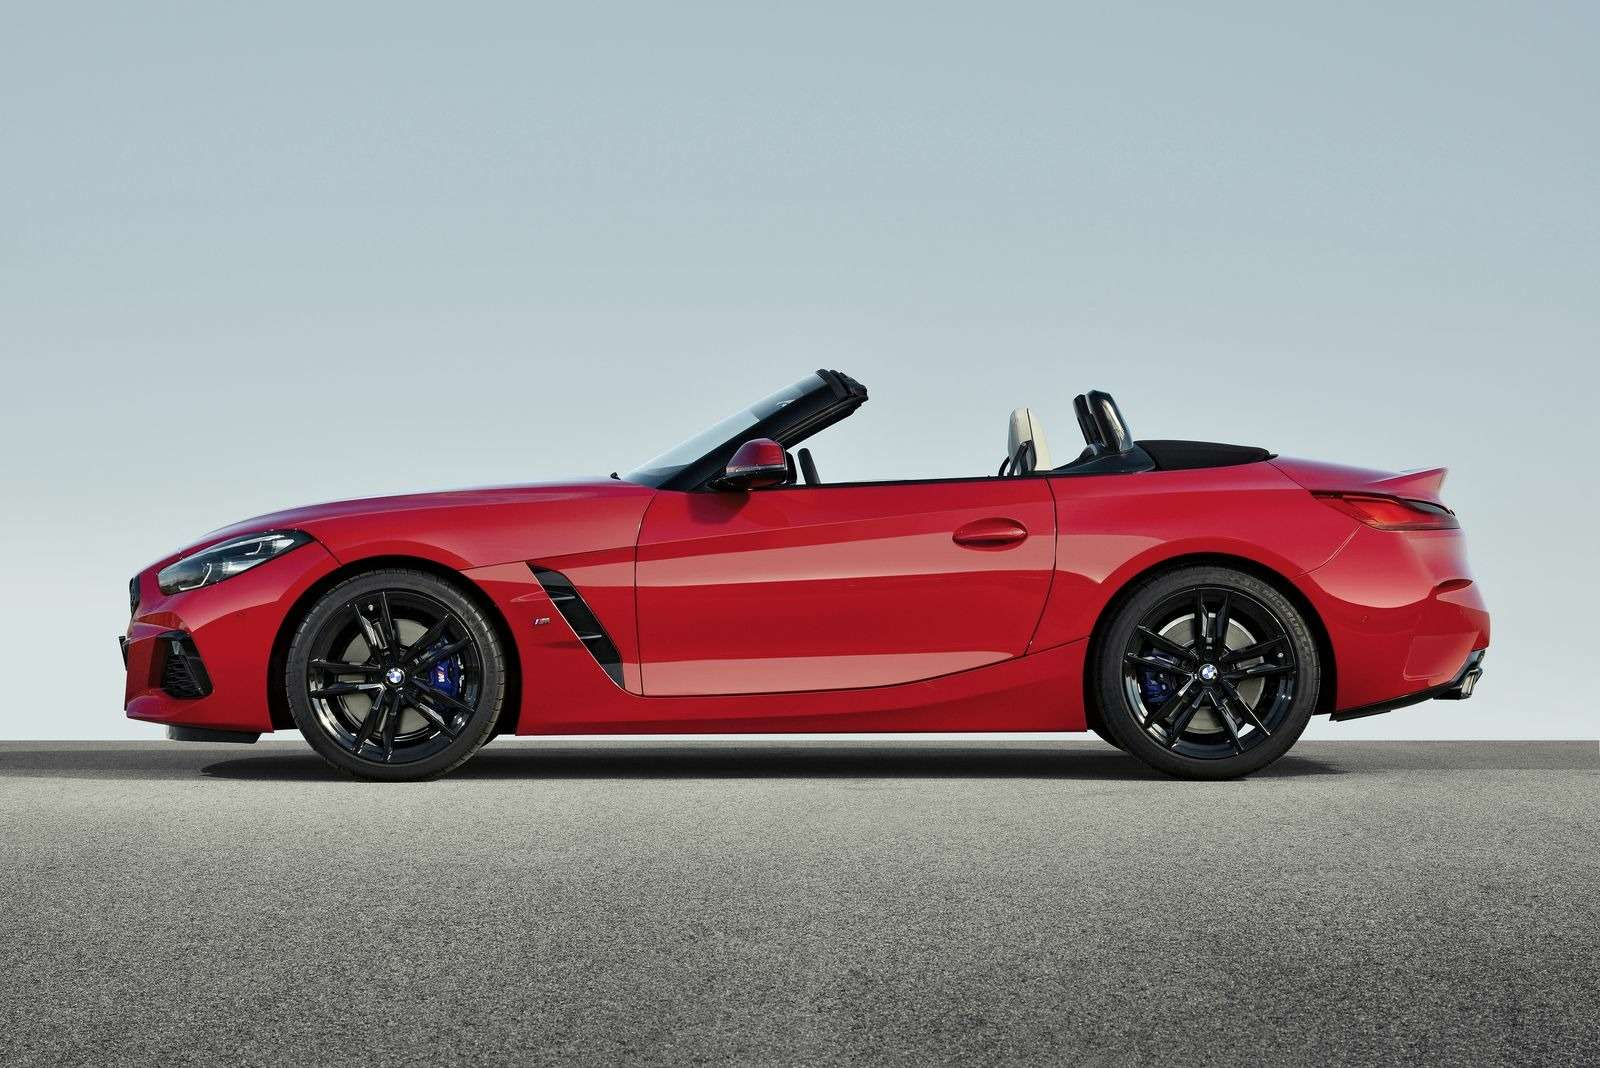 Новый родстер BMW Z4представлен официально— фото 898546